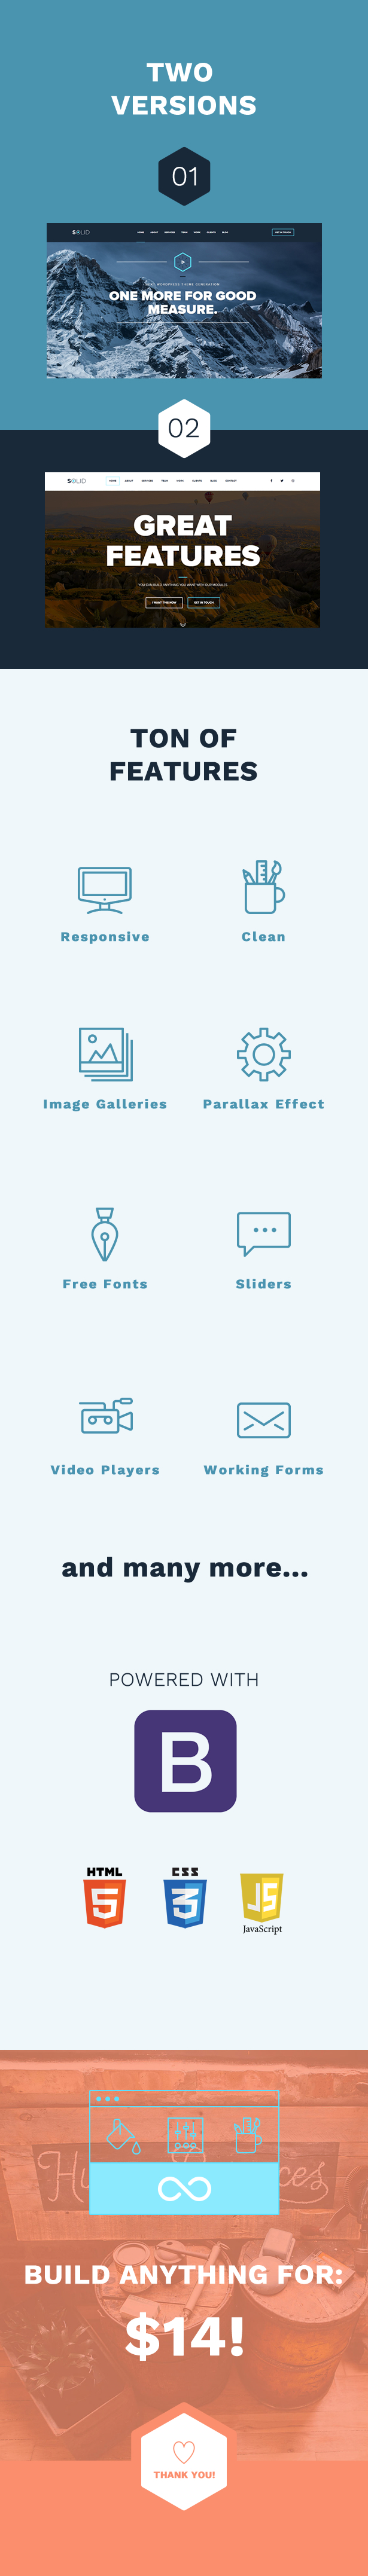 Solid - Full Responsive Versatile HTML5 Template - 1